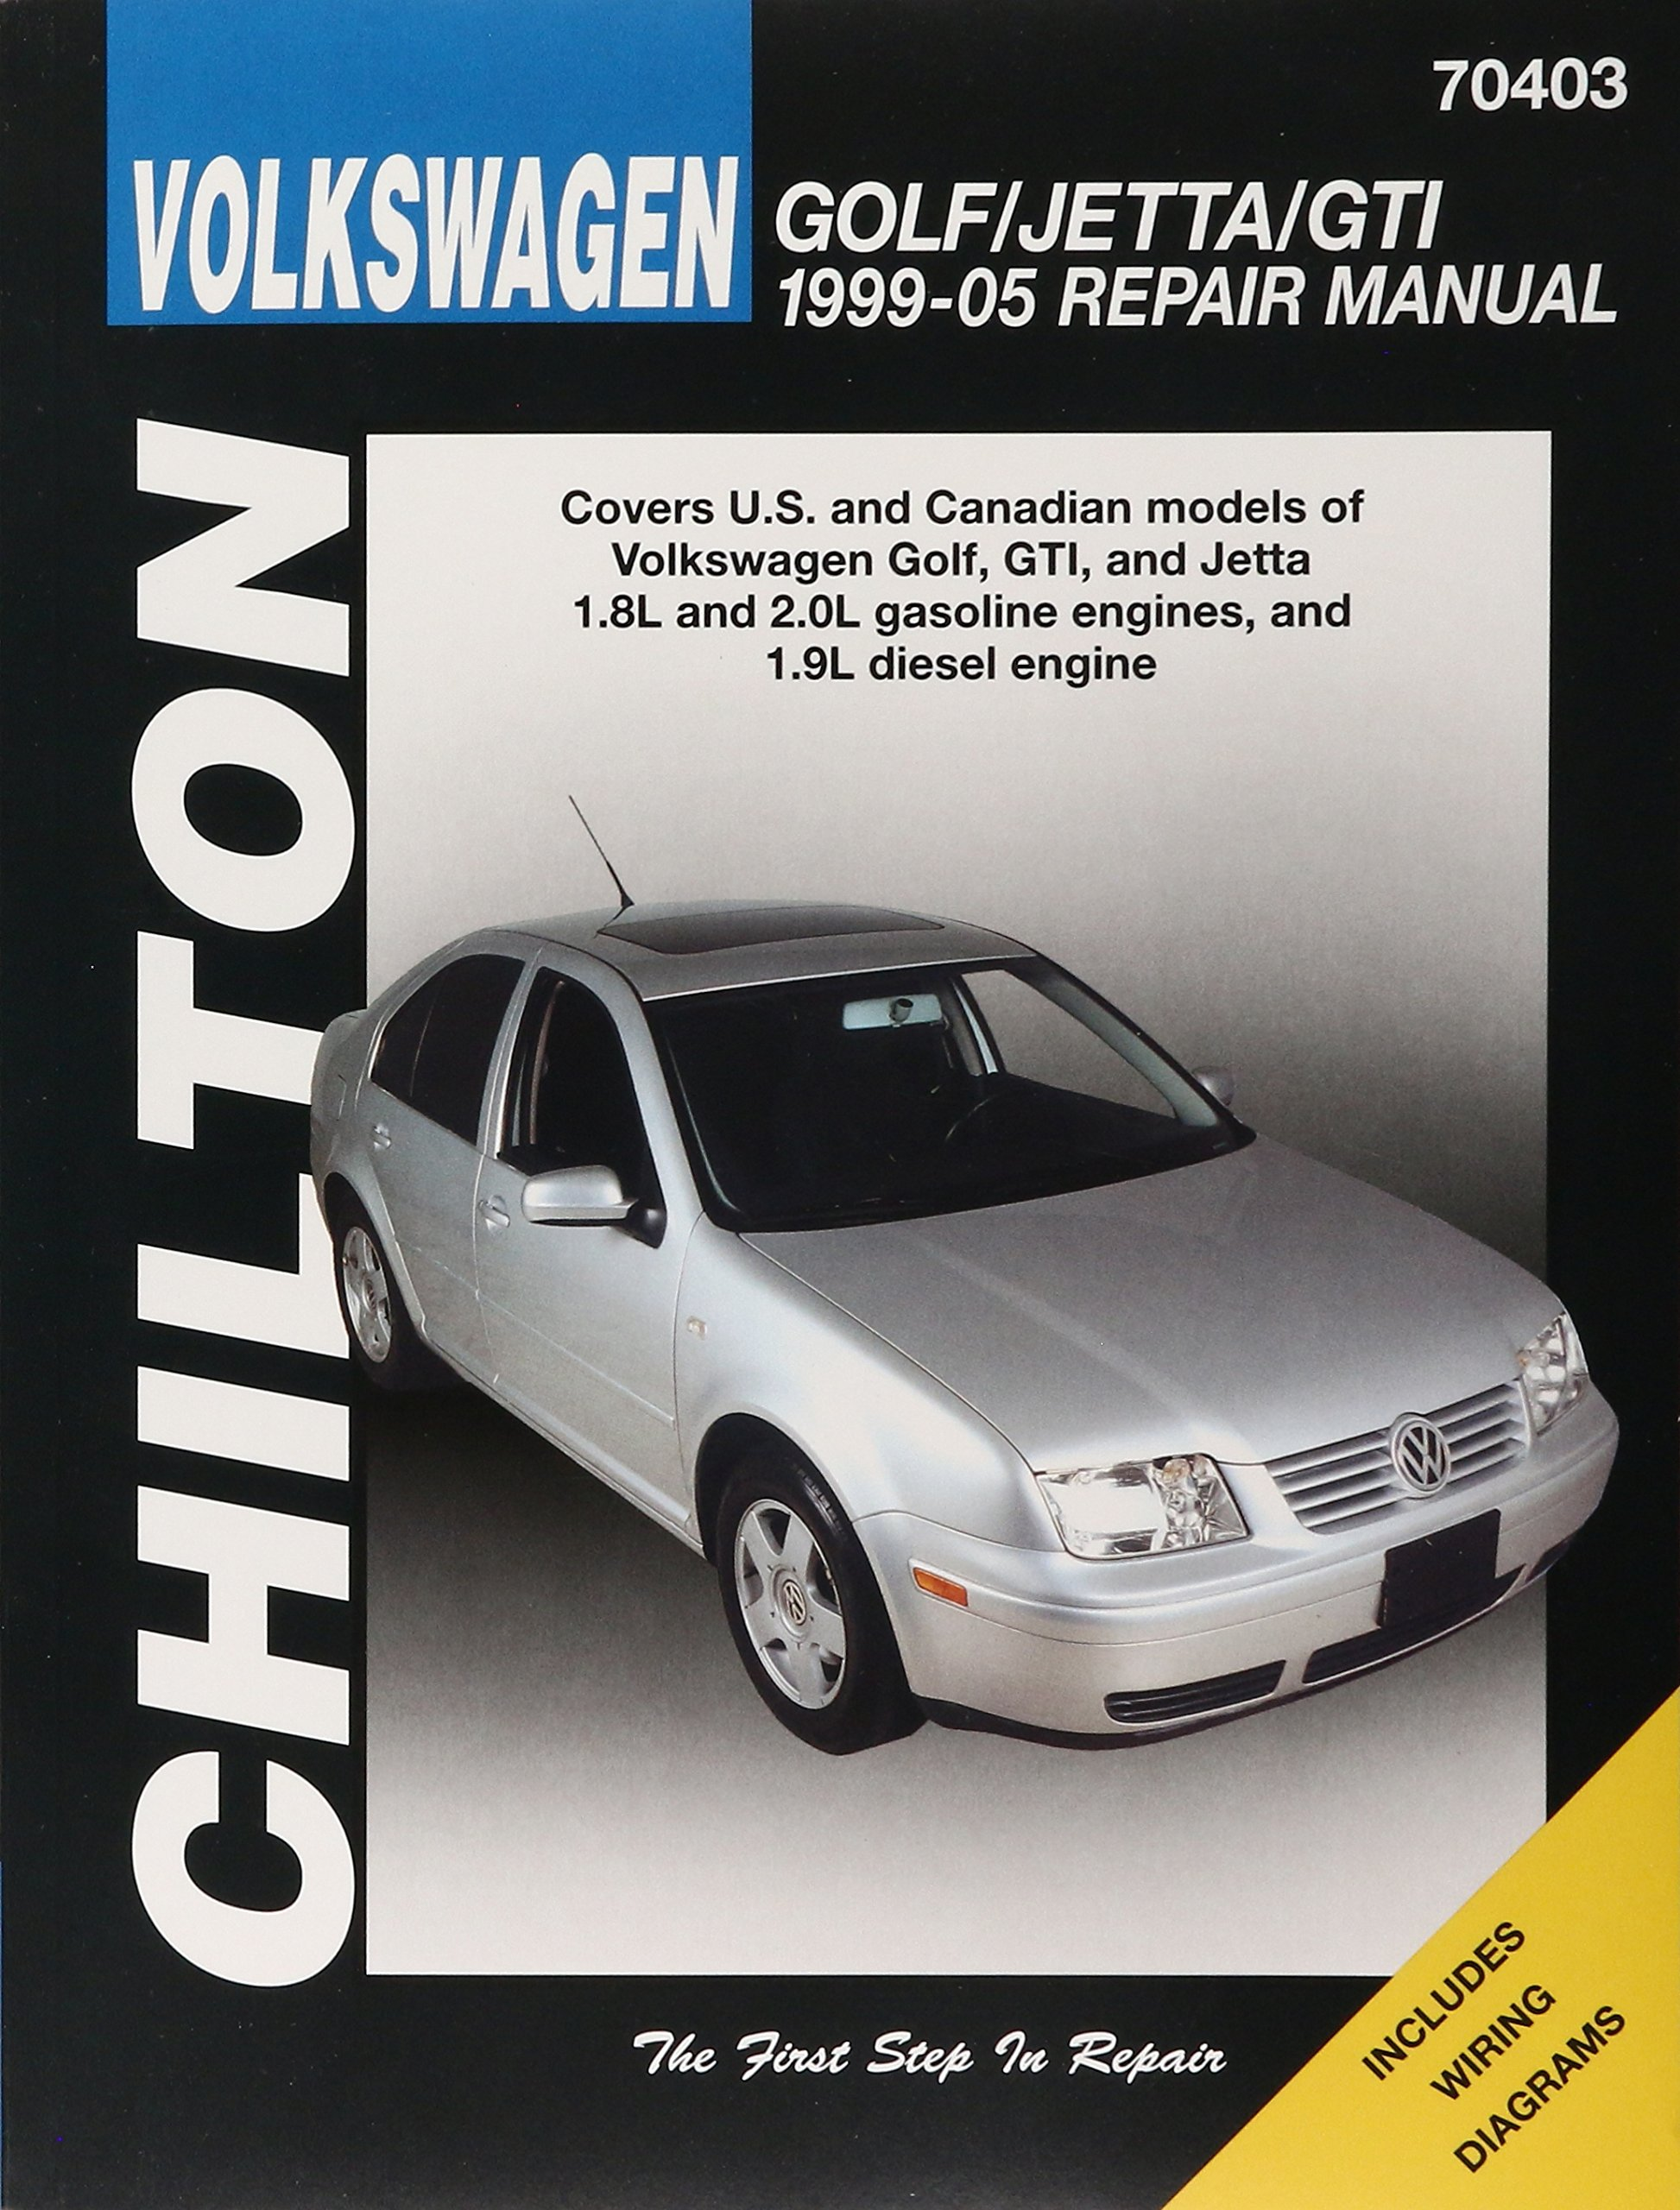 Volkswagen Golf/Jetta/GTI 1999-2005 Repair Manual (Chilton's Total Car Care  Repair Manuals): Chilton: 9781563927188: Amazon.com: Books | 2005 Gti Wiring Diagram |  | Amazon.com